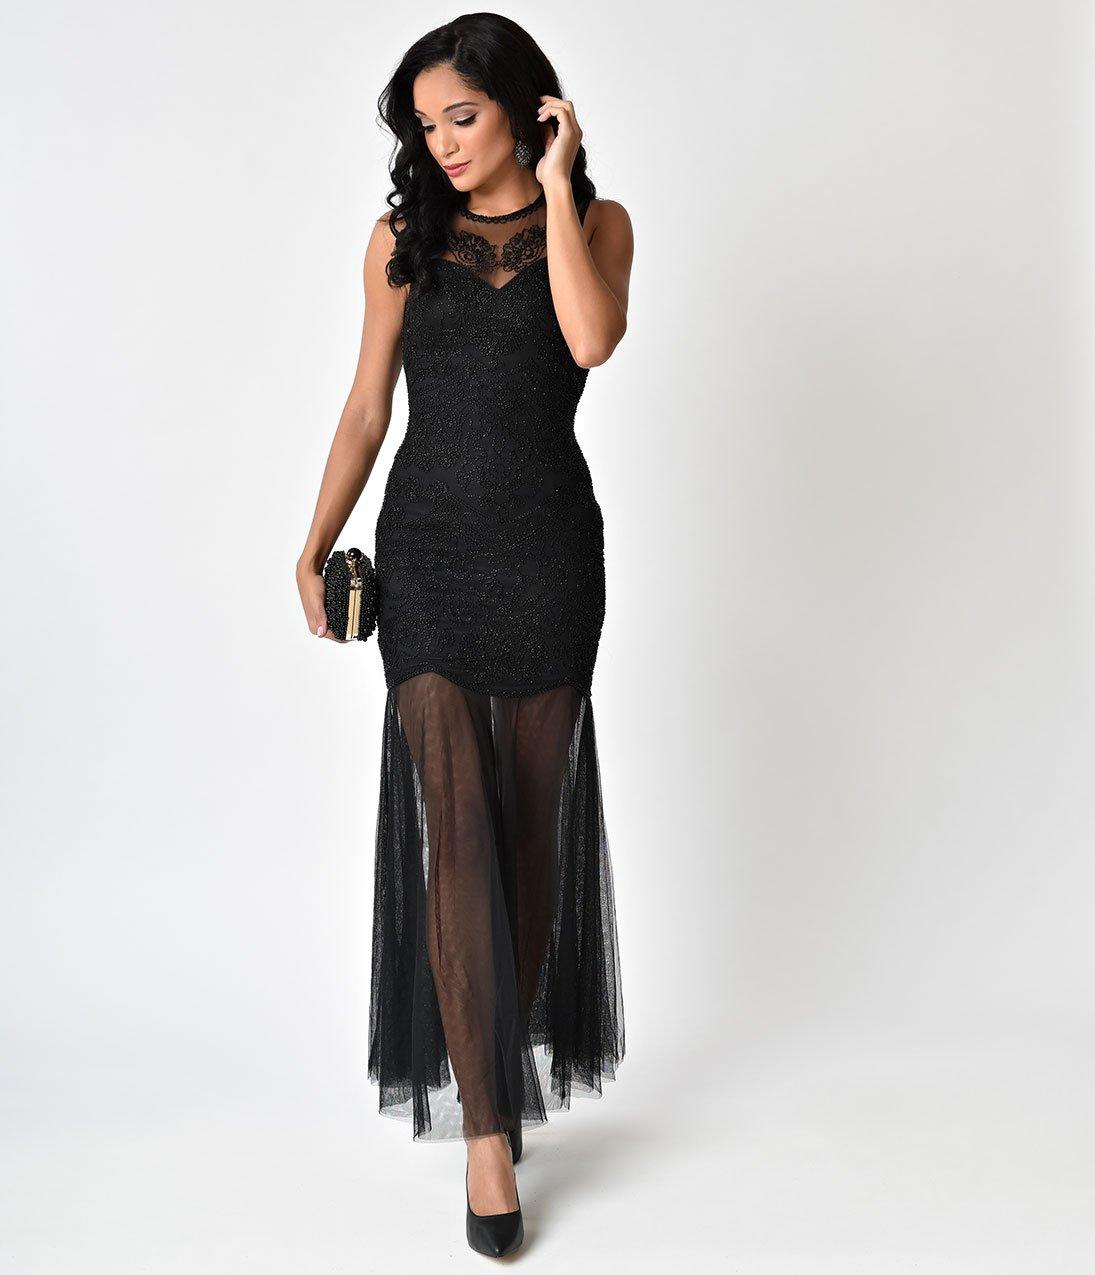 Black_Beaded_Mermaid_Long_Flapper-Style_Cocktail_Dress_5_2048x2048.jpg